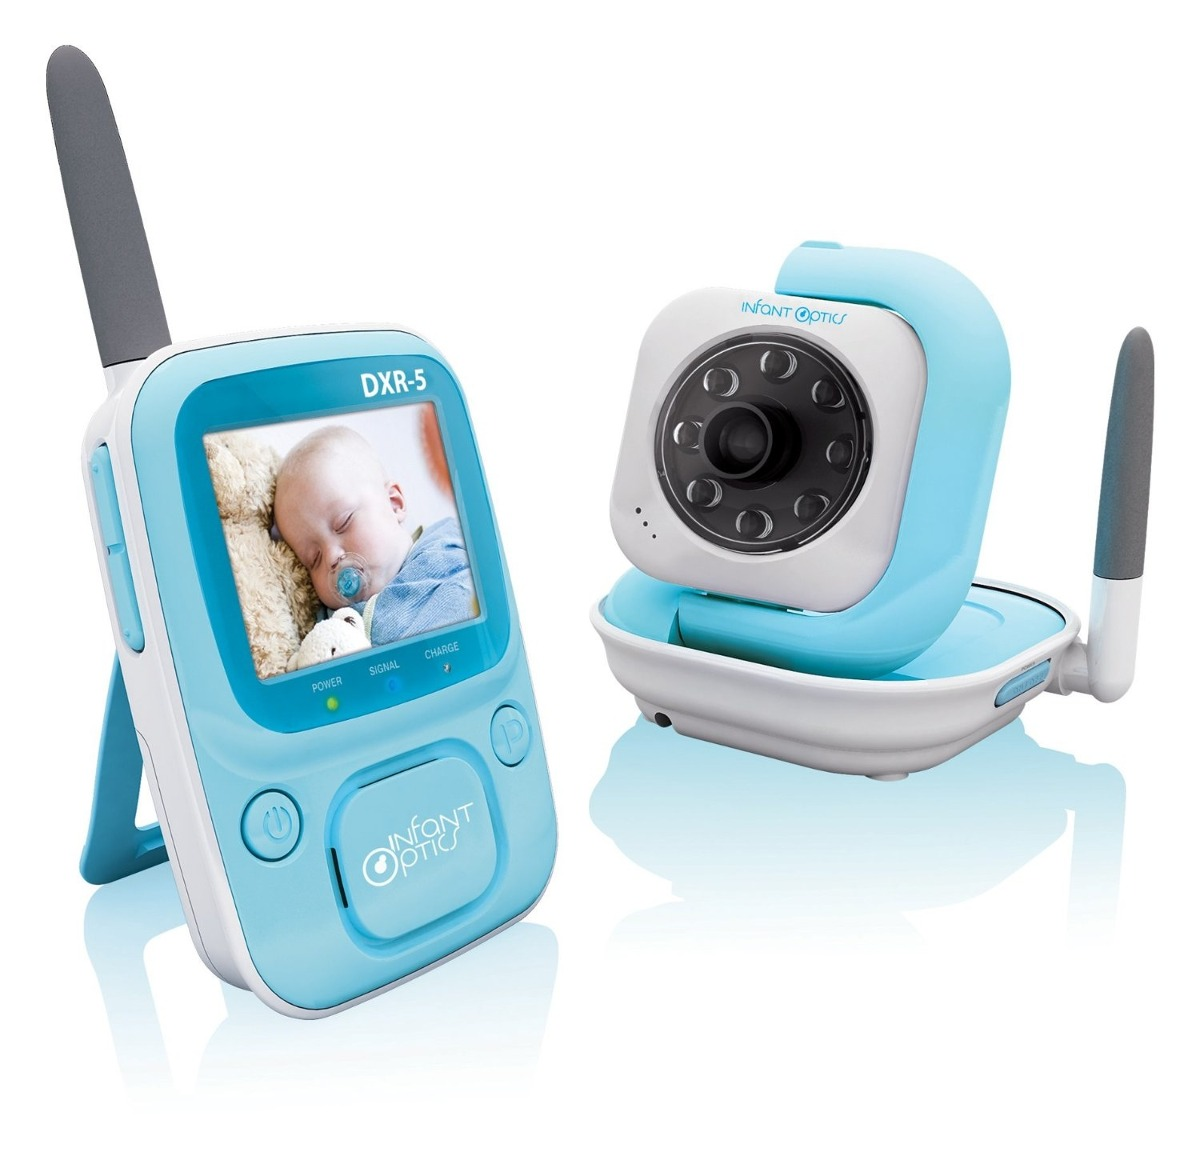 monitor para bebes camara infant optics dxr 5 2 4 ghz 2 en mercadolibre. Black Bedroom Furniture Sets. Home Design Ideas